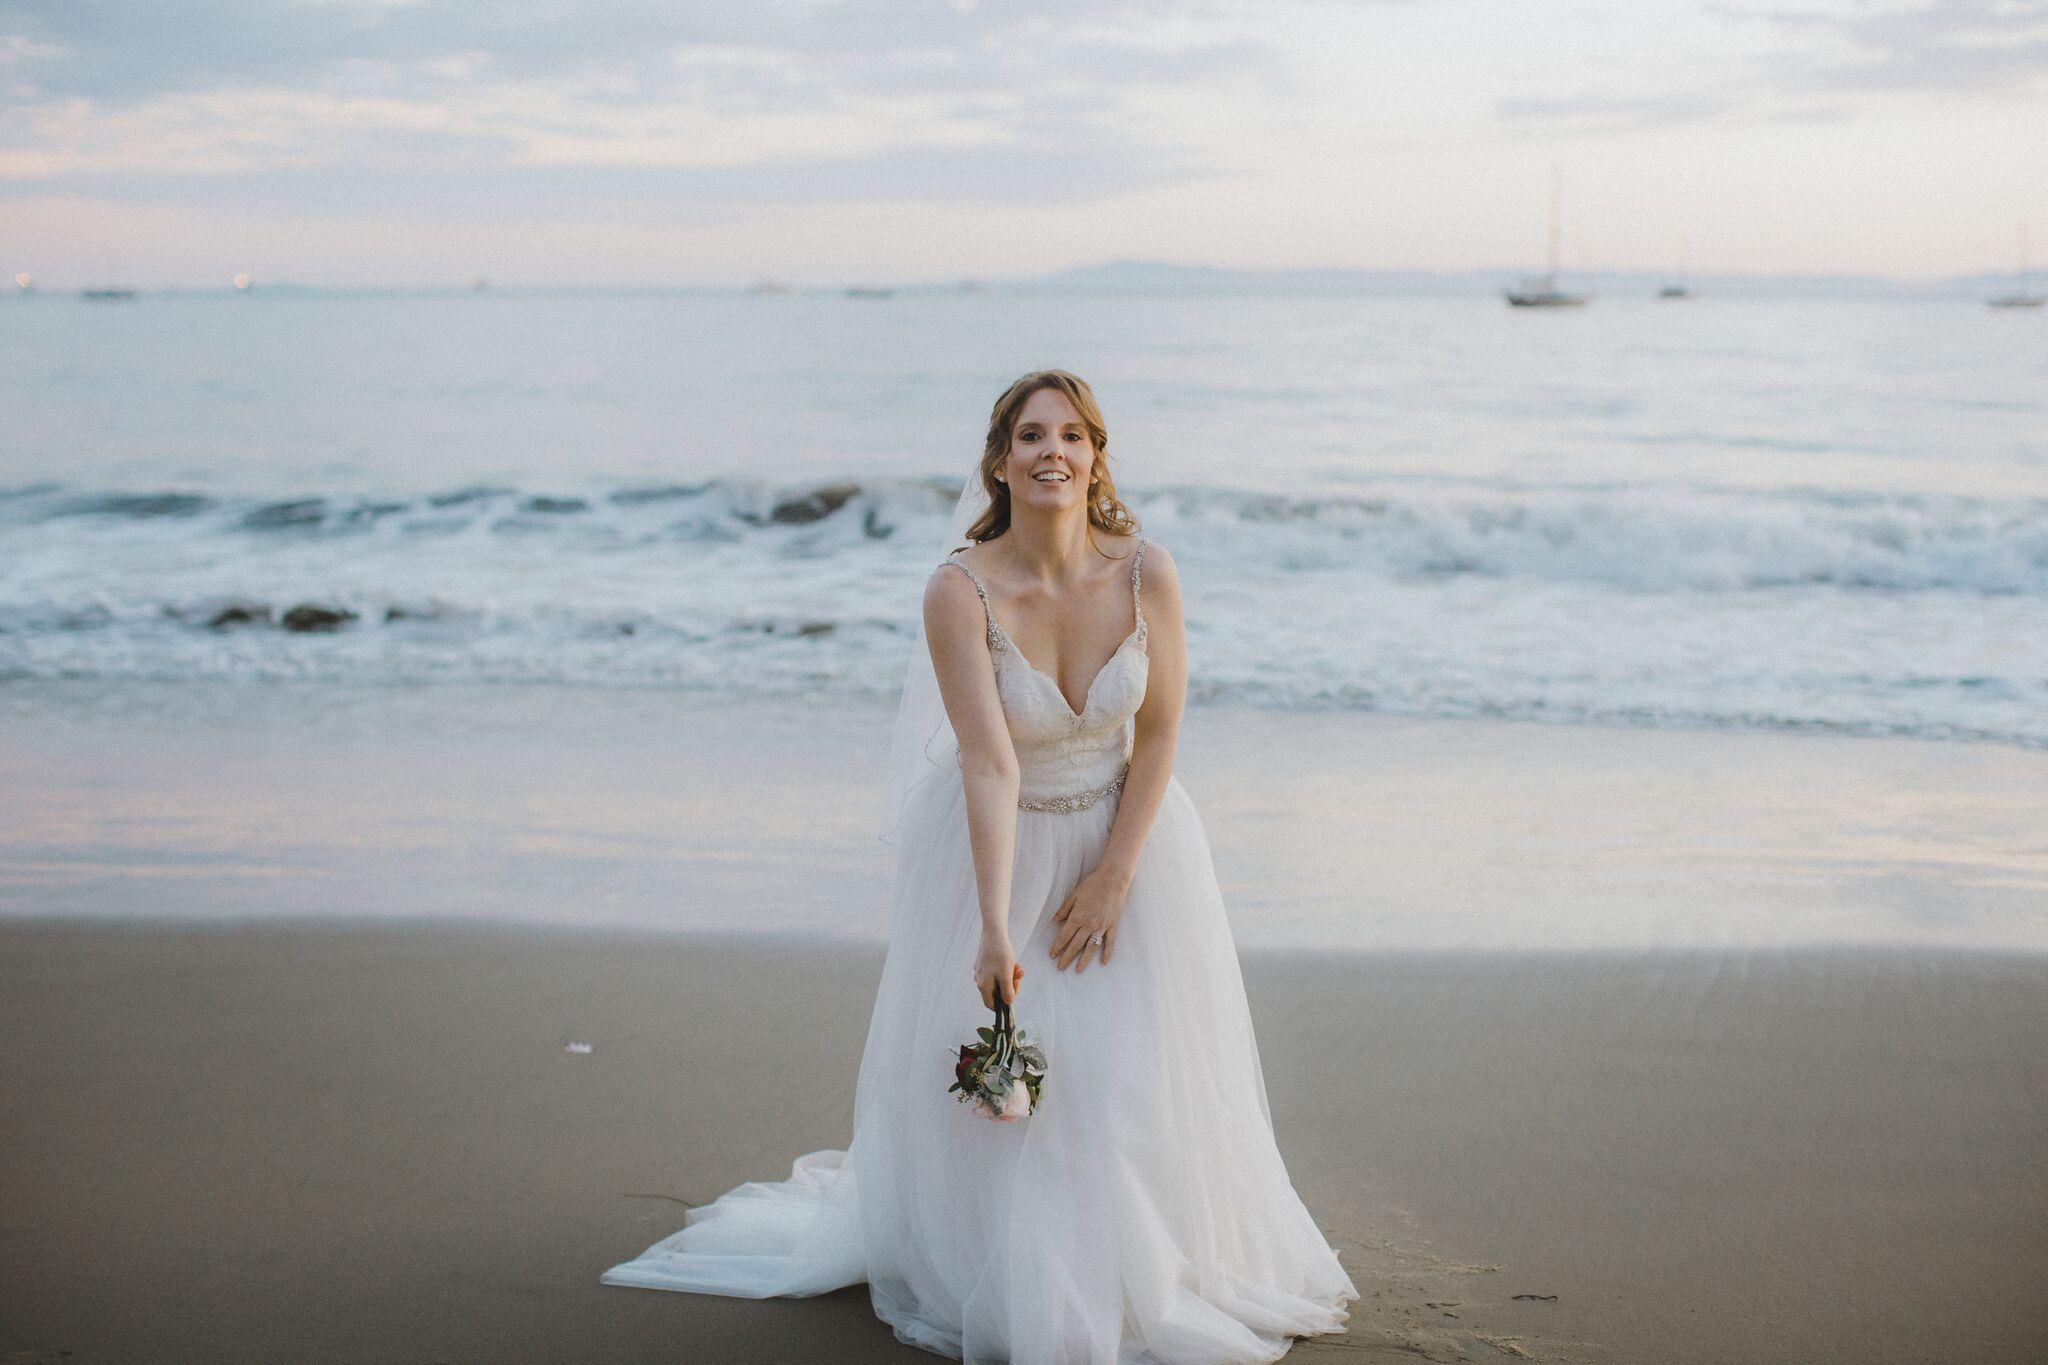 www.santabarbawedding.com | Venue: Santa Barbara Courthouse | Photography: Ryanne Bee Photography | Officiant: Santa Barbara Classic Weddings | Bride Tossing Bouquet into the Ocean